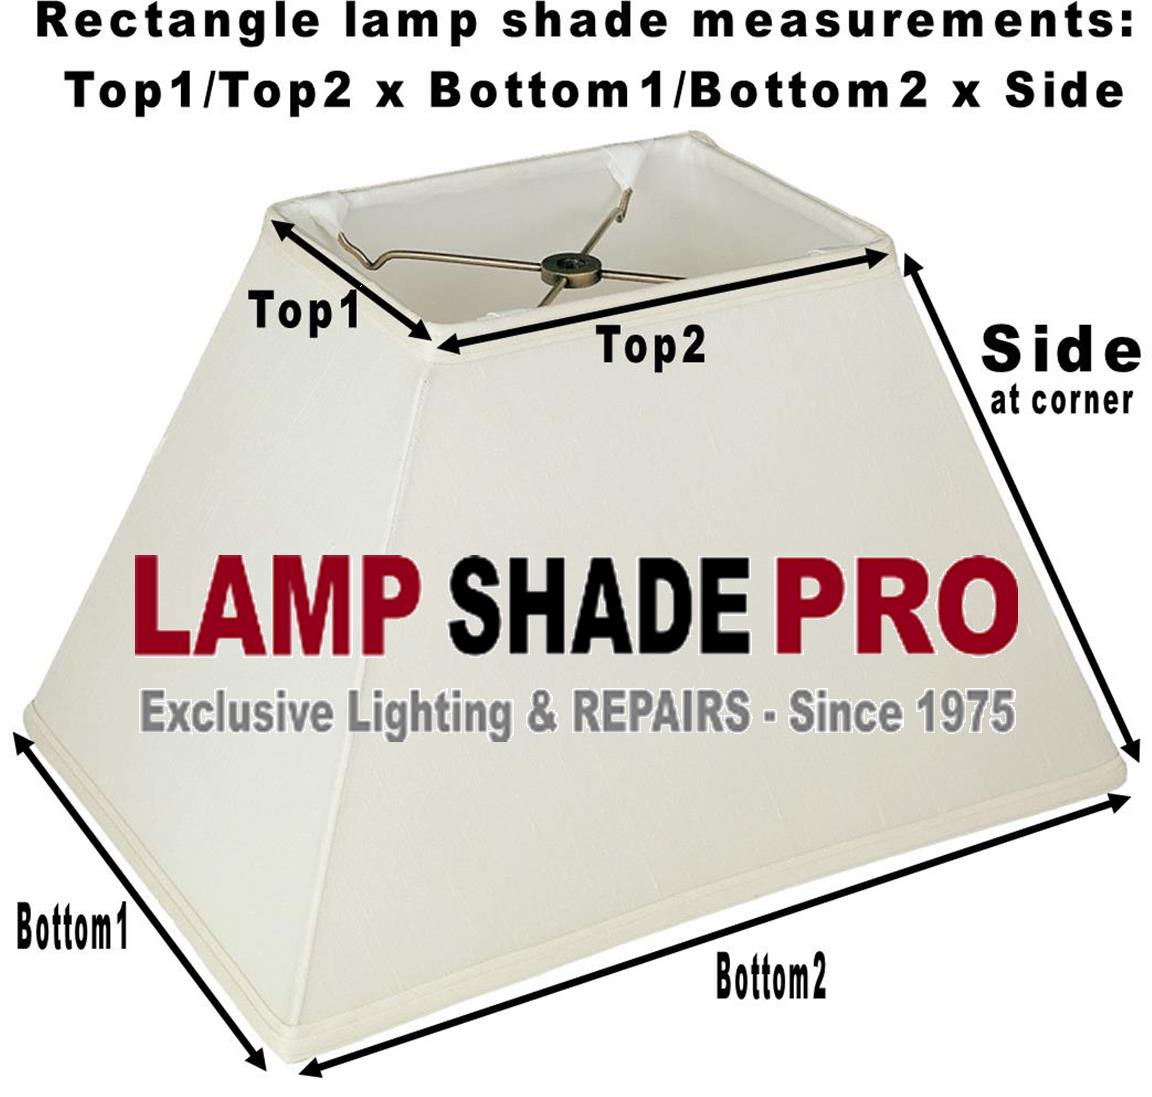 Rectangle Lamp Shade Measurements